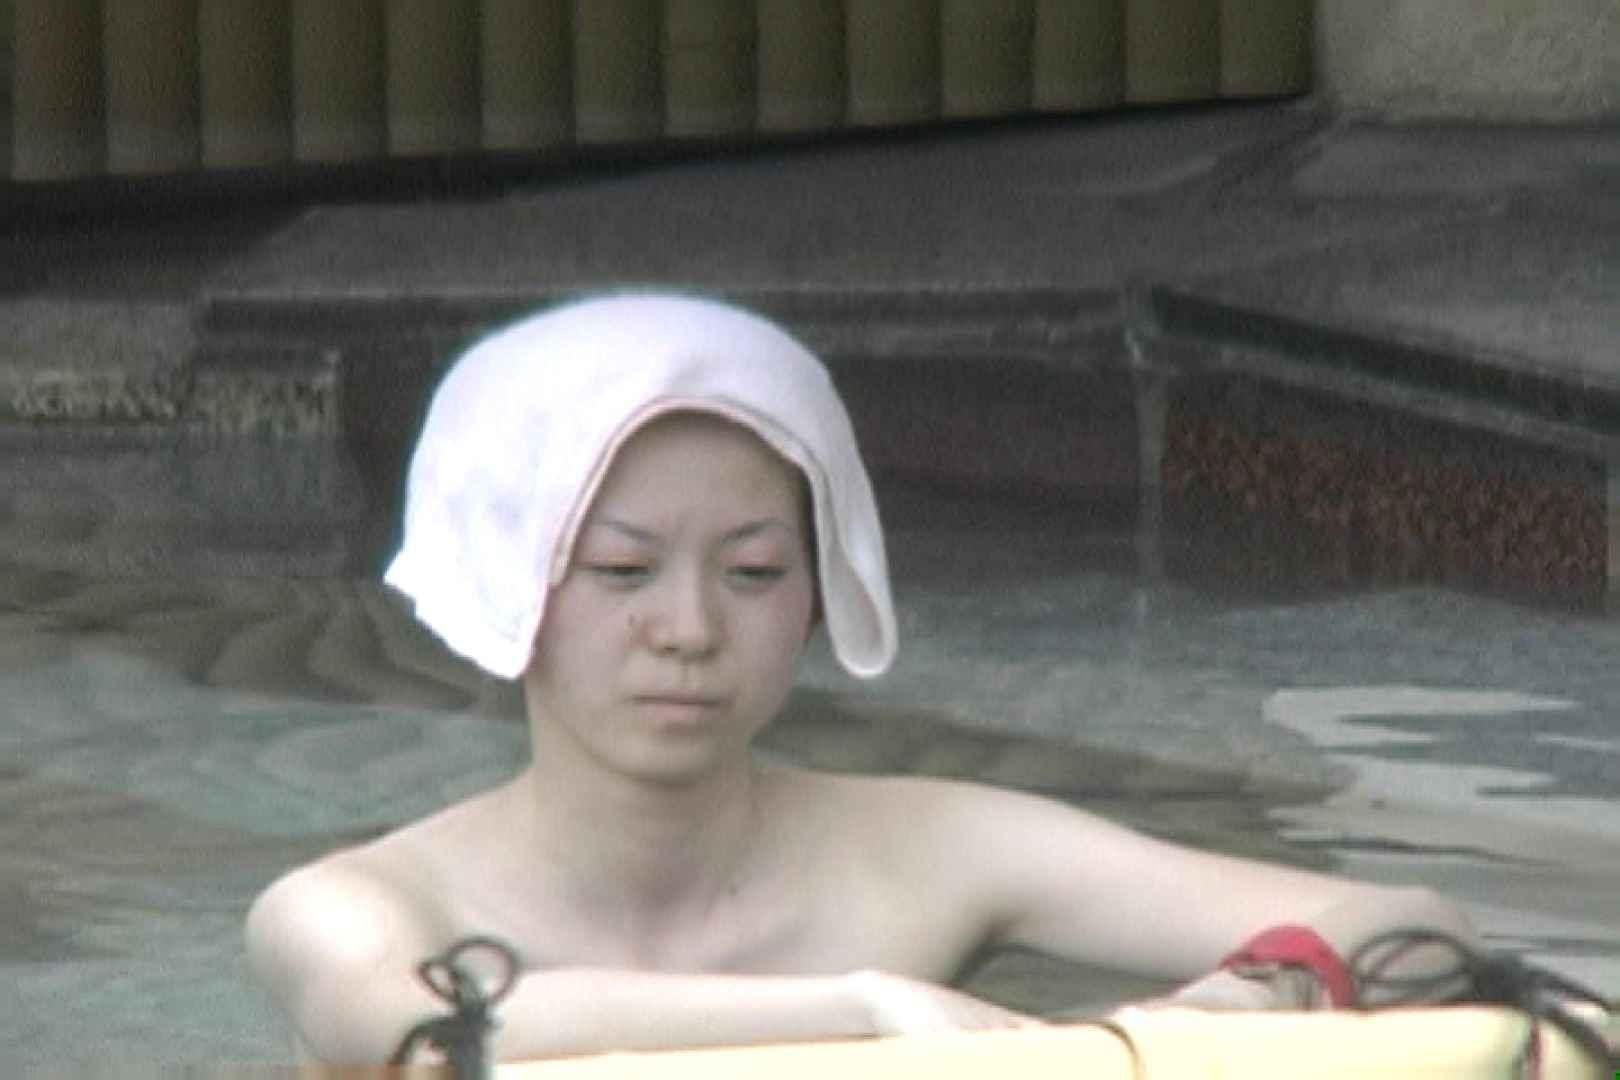 Aquaな露天風呂Vol.693 露天風呂編 | 盗撮シリーズ  105PIX 9